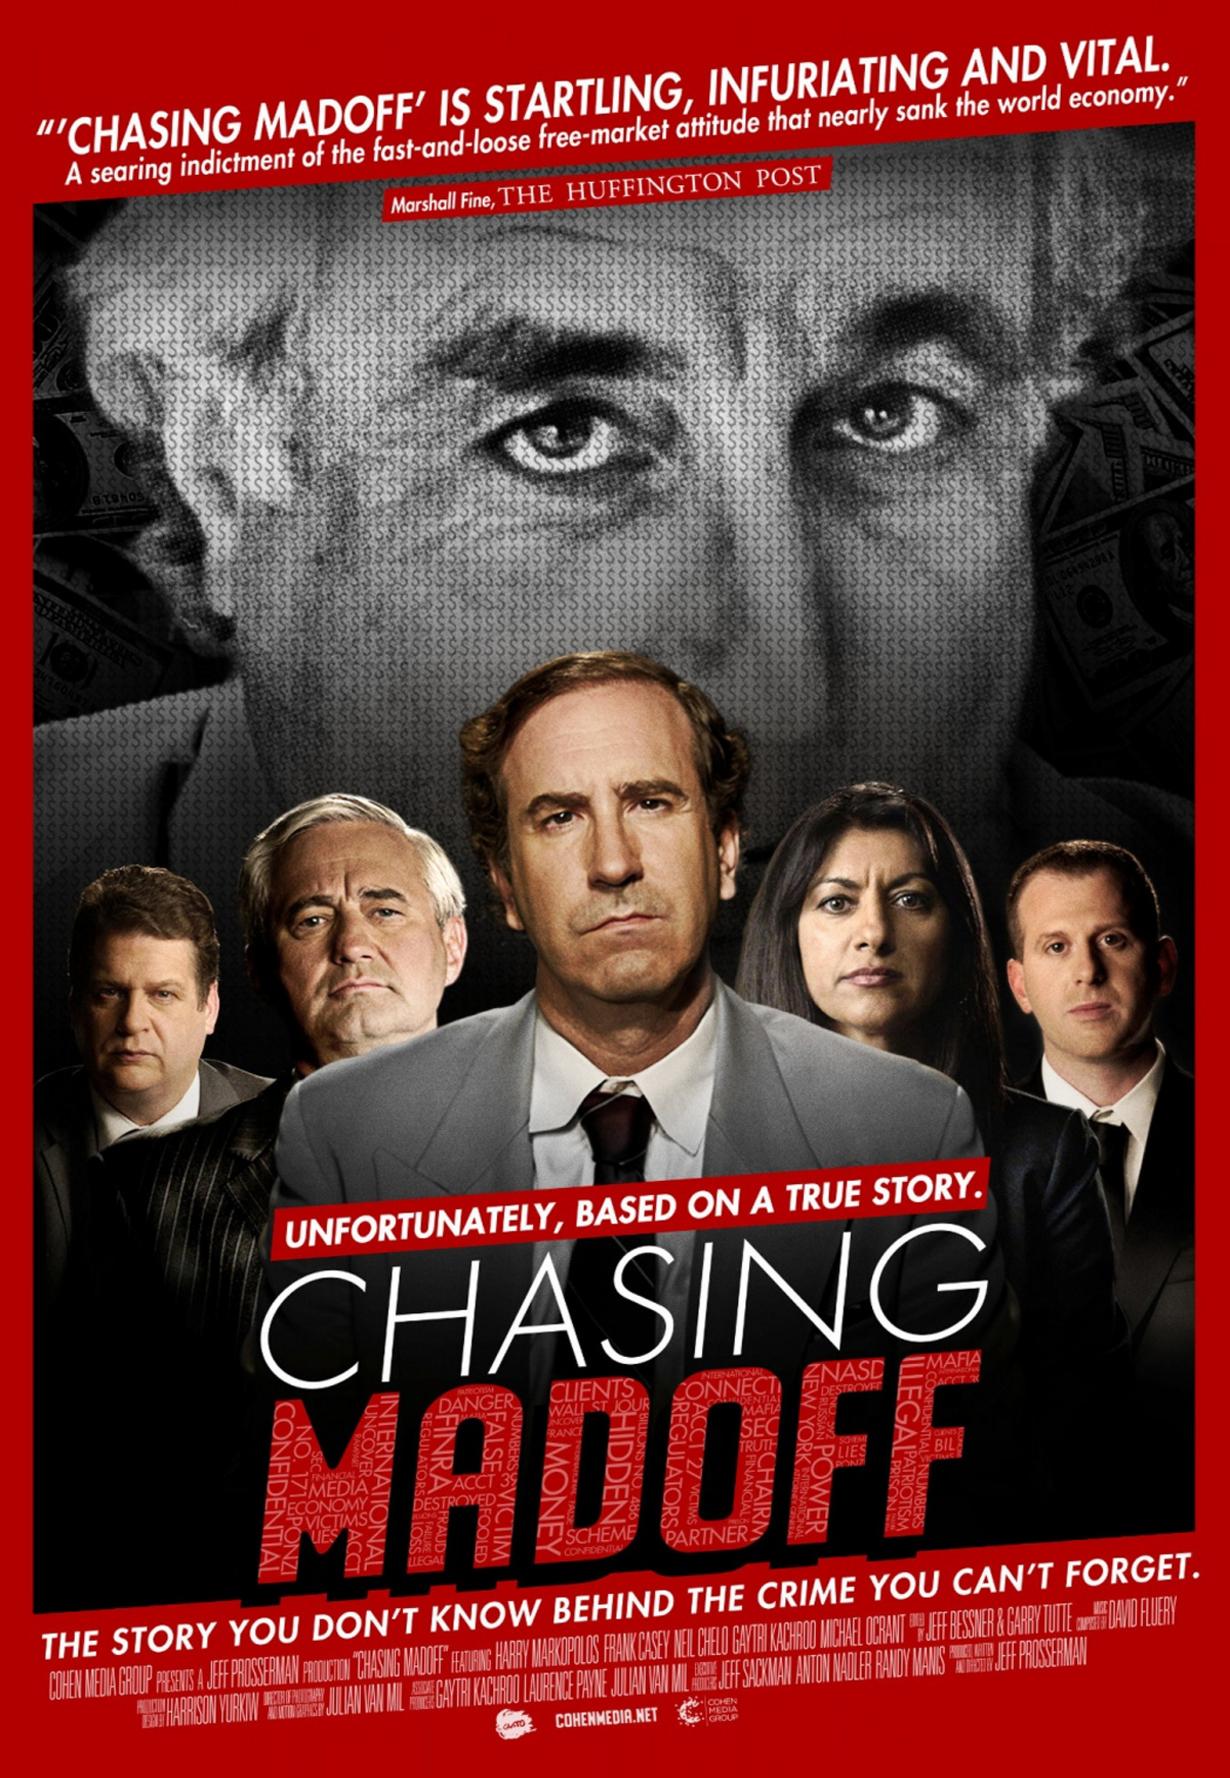 Chasing Madoff - Movie Poster #1 (Original)